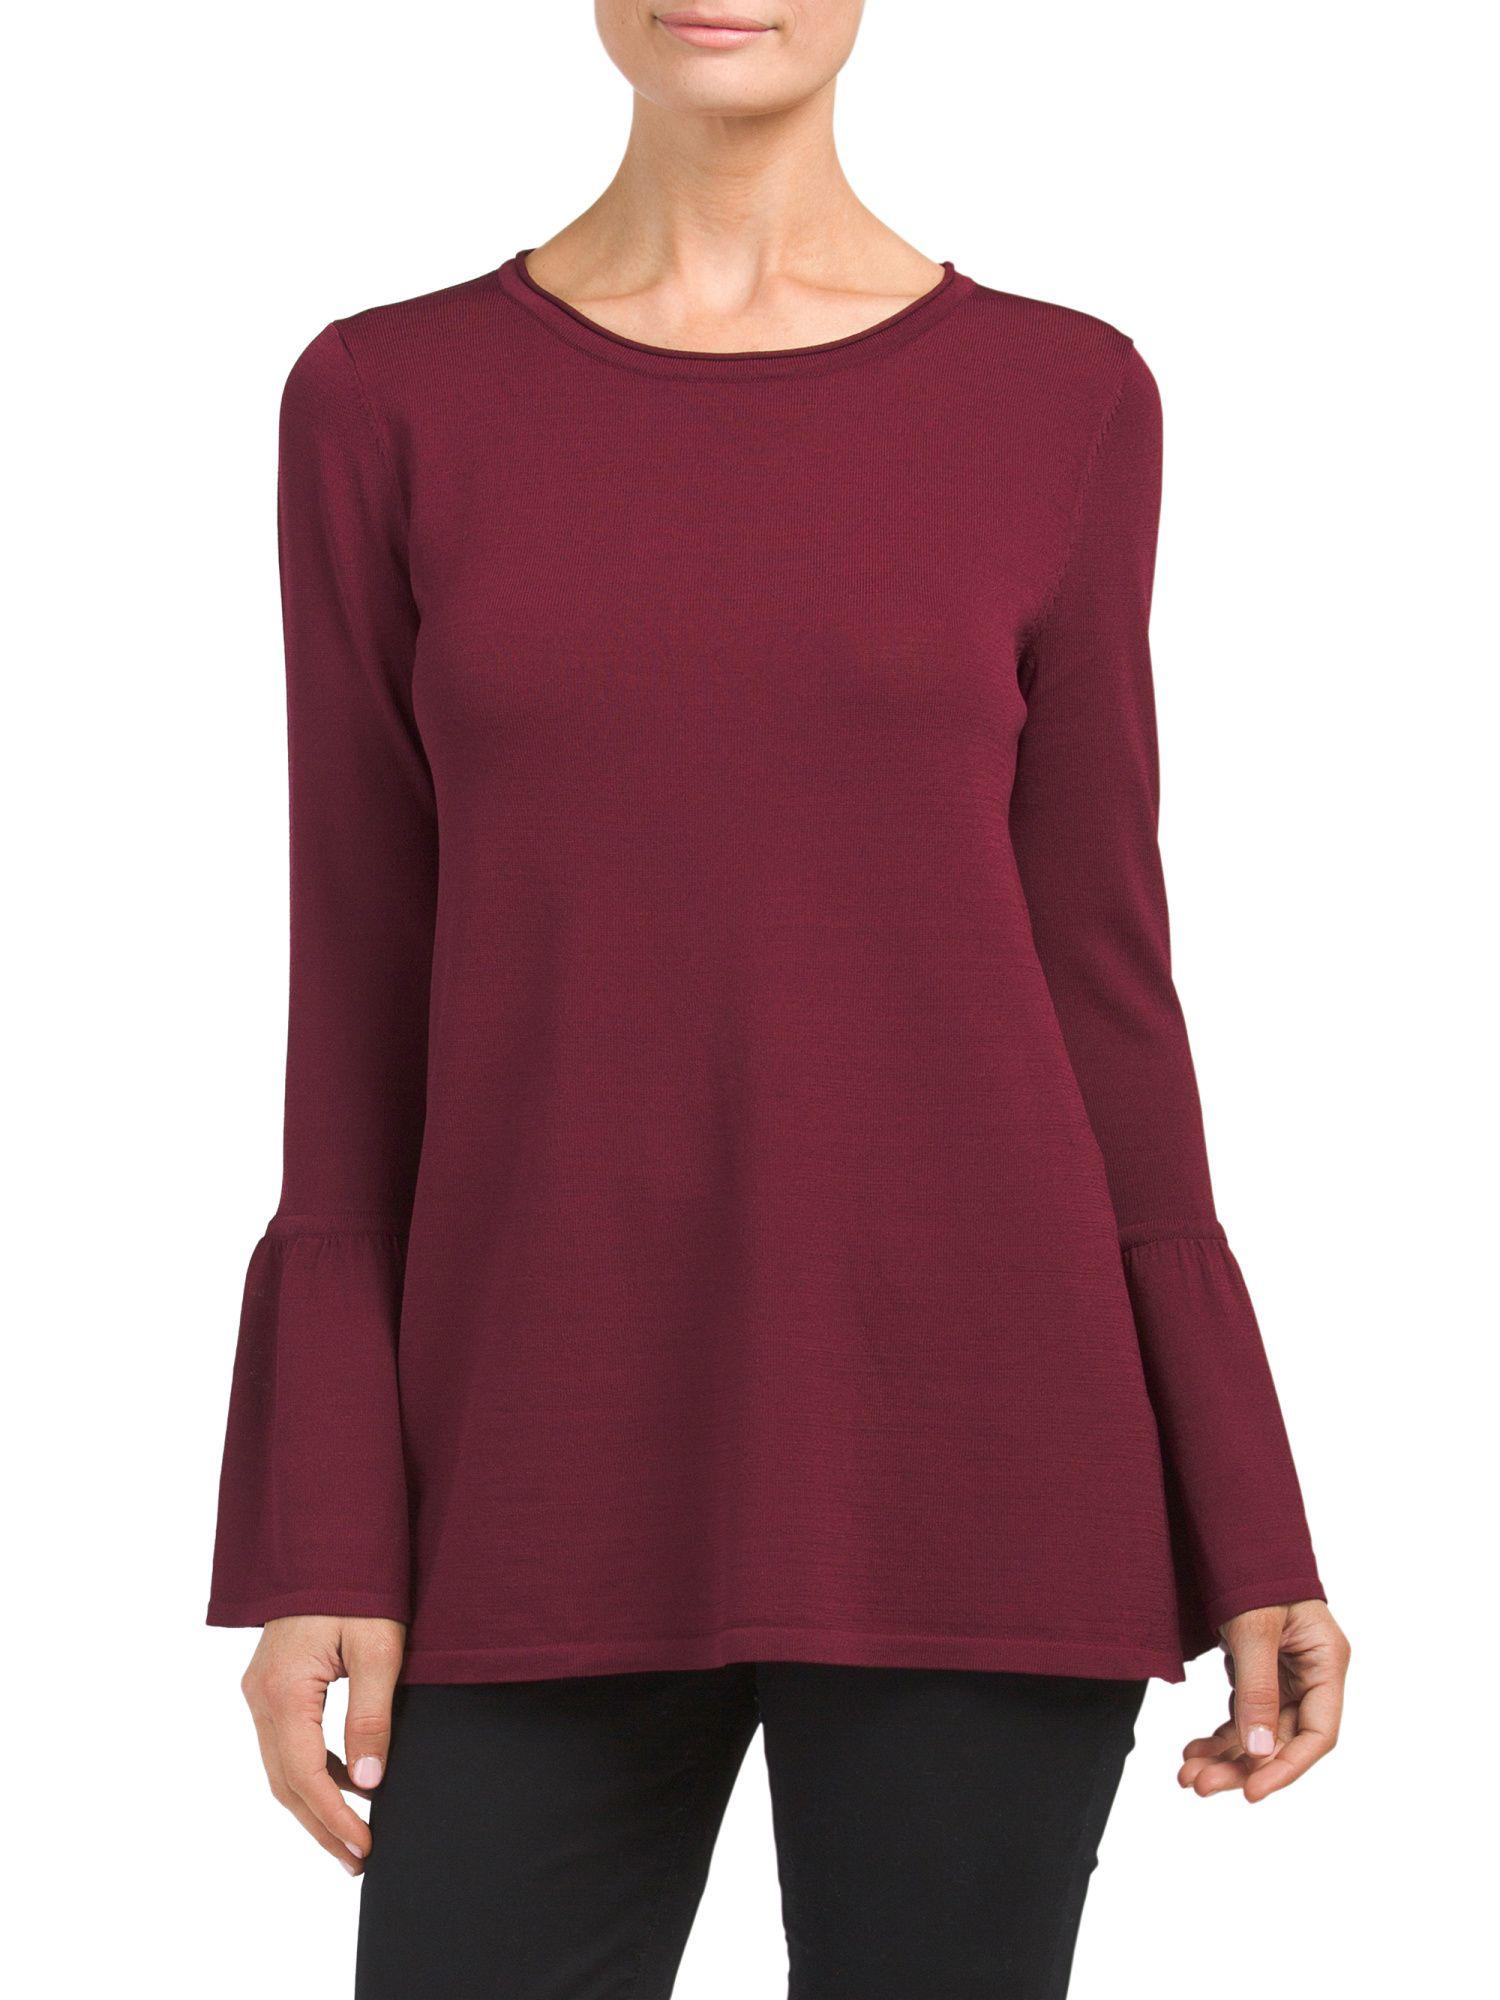 c58bdd810ca1d  24.99 - CUPIO Bell Sleeve Pullover Swing Sweater